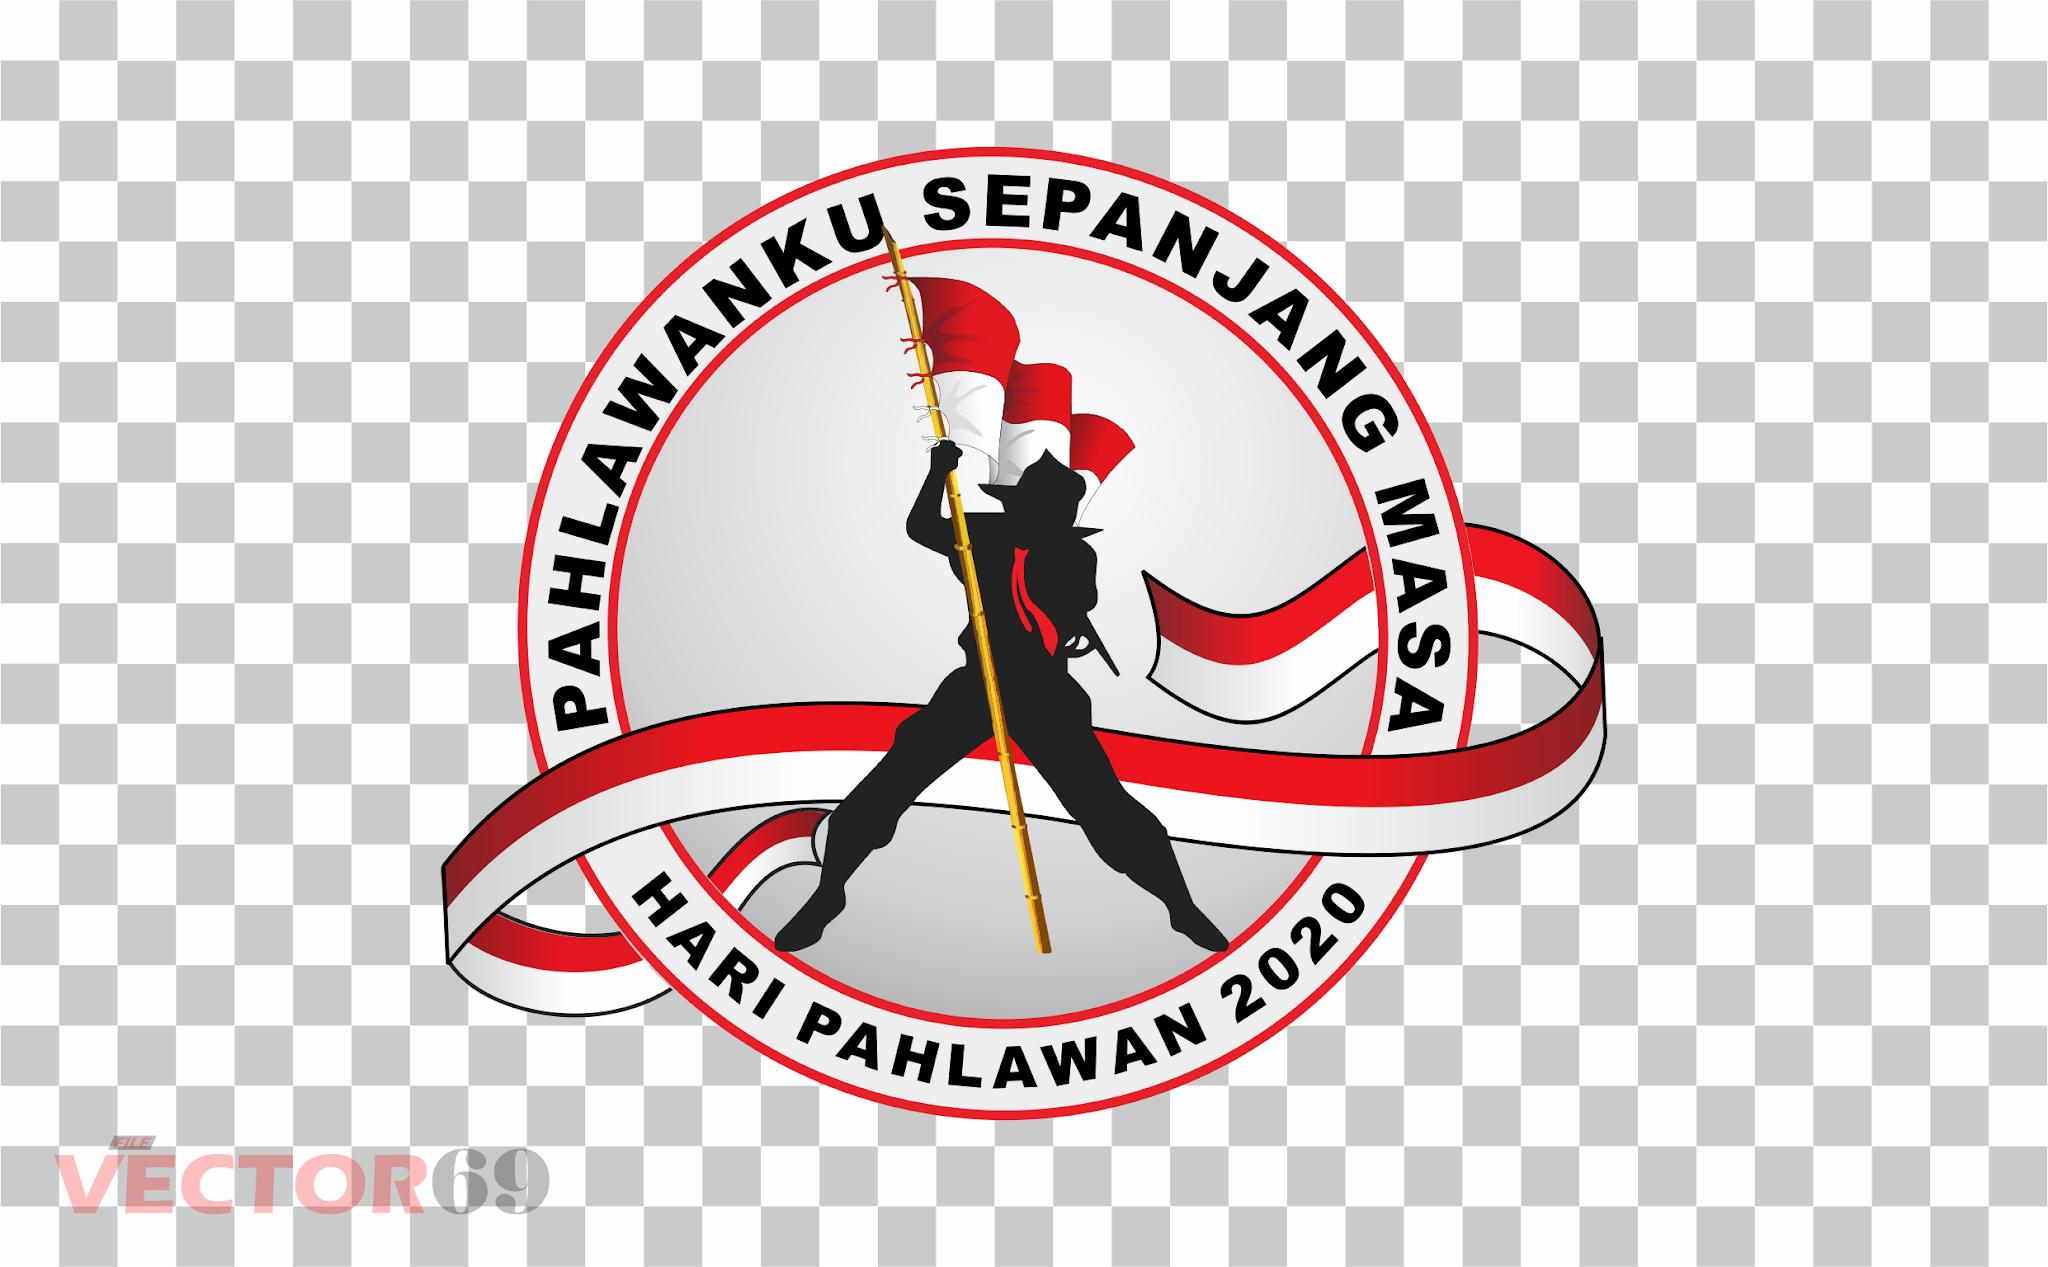 Hari Pahlawan 2020 Logo - Download Vector File PNG (Portable Network Graphics)